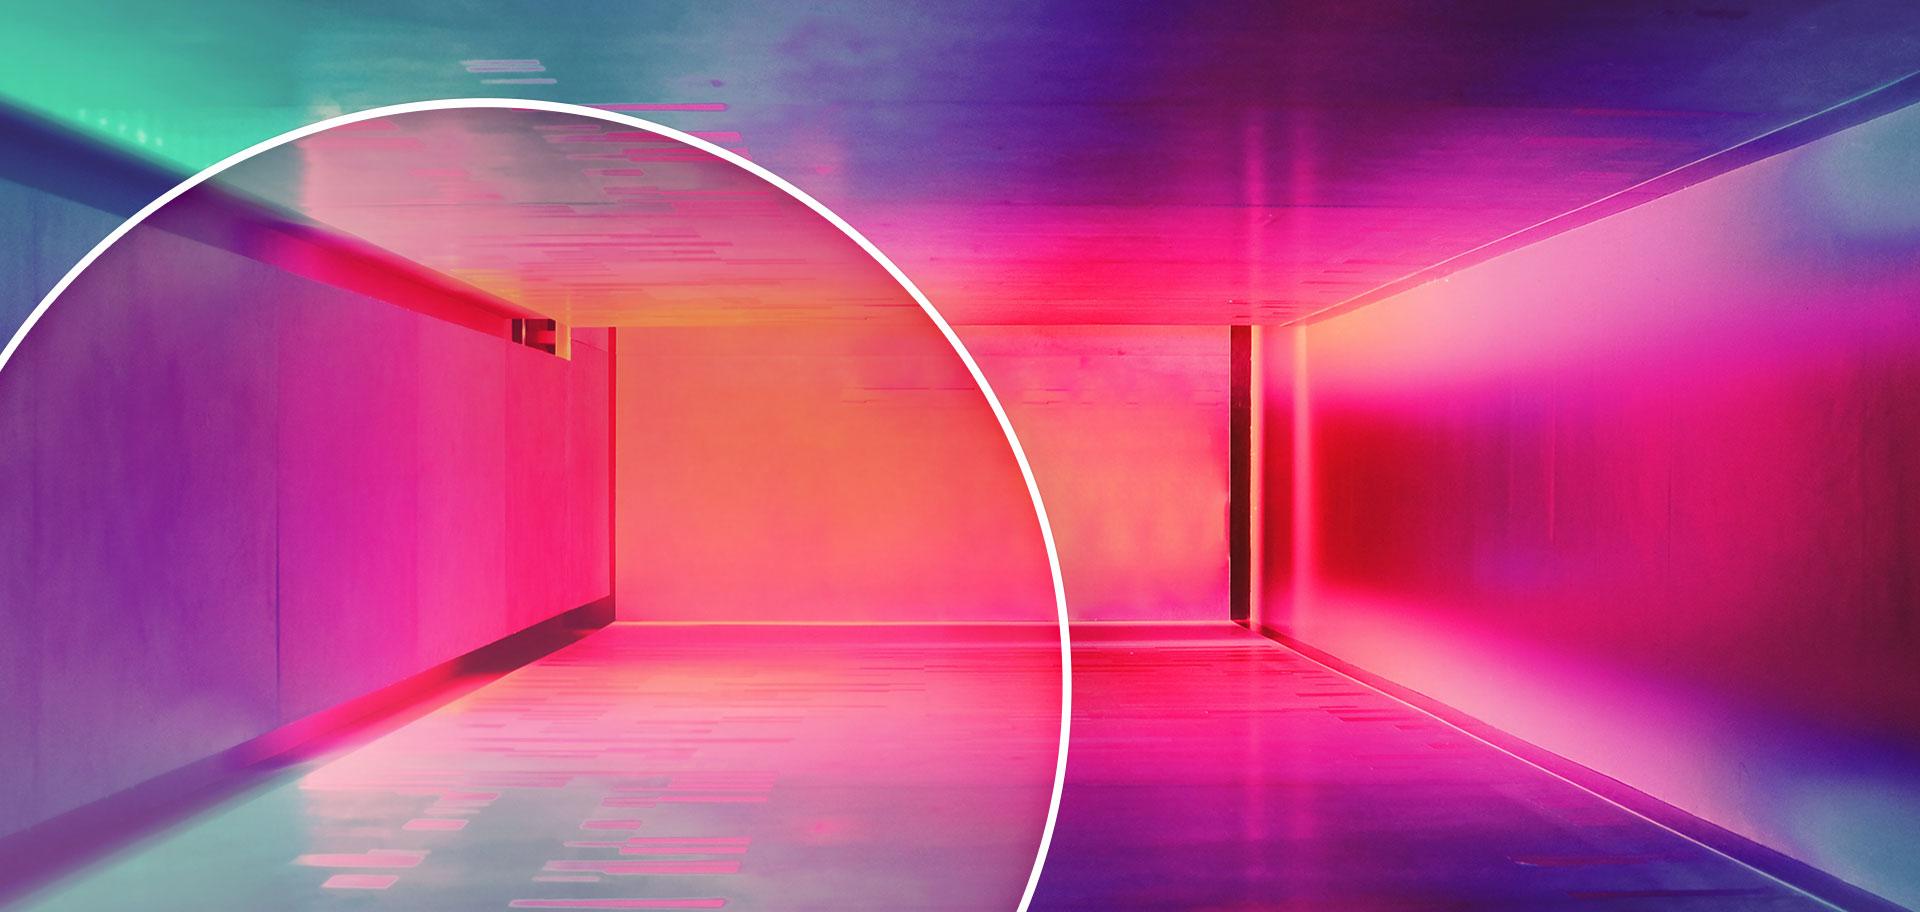 Color Inspiration Part II: 12 More Hues to Stir the Senses